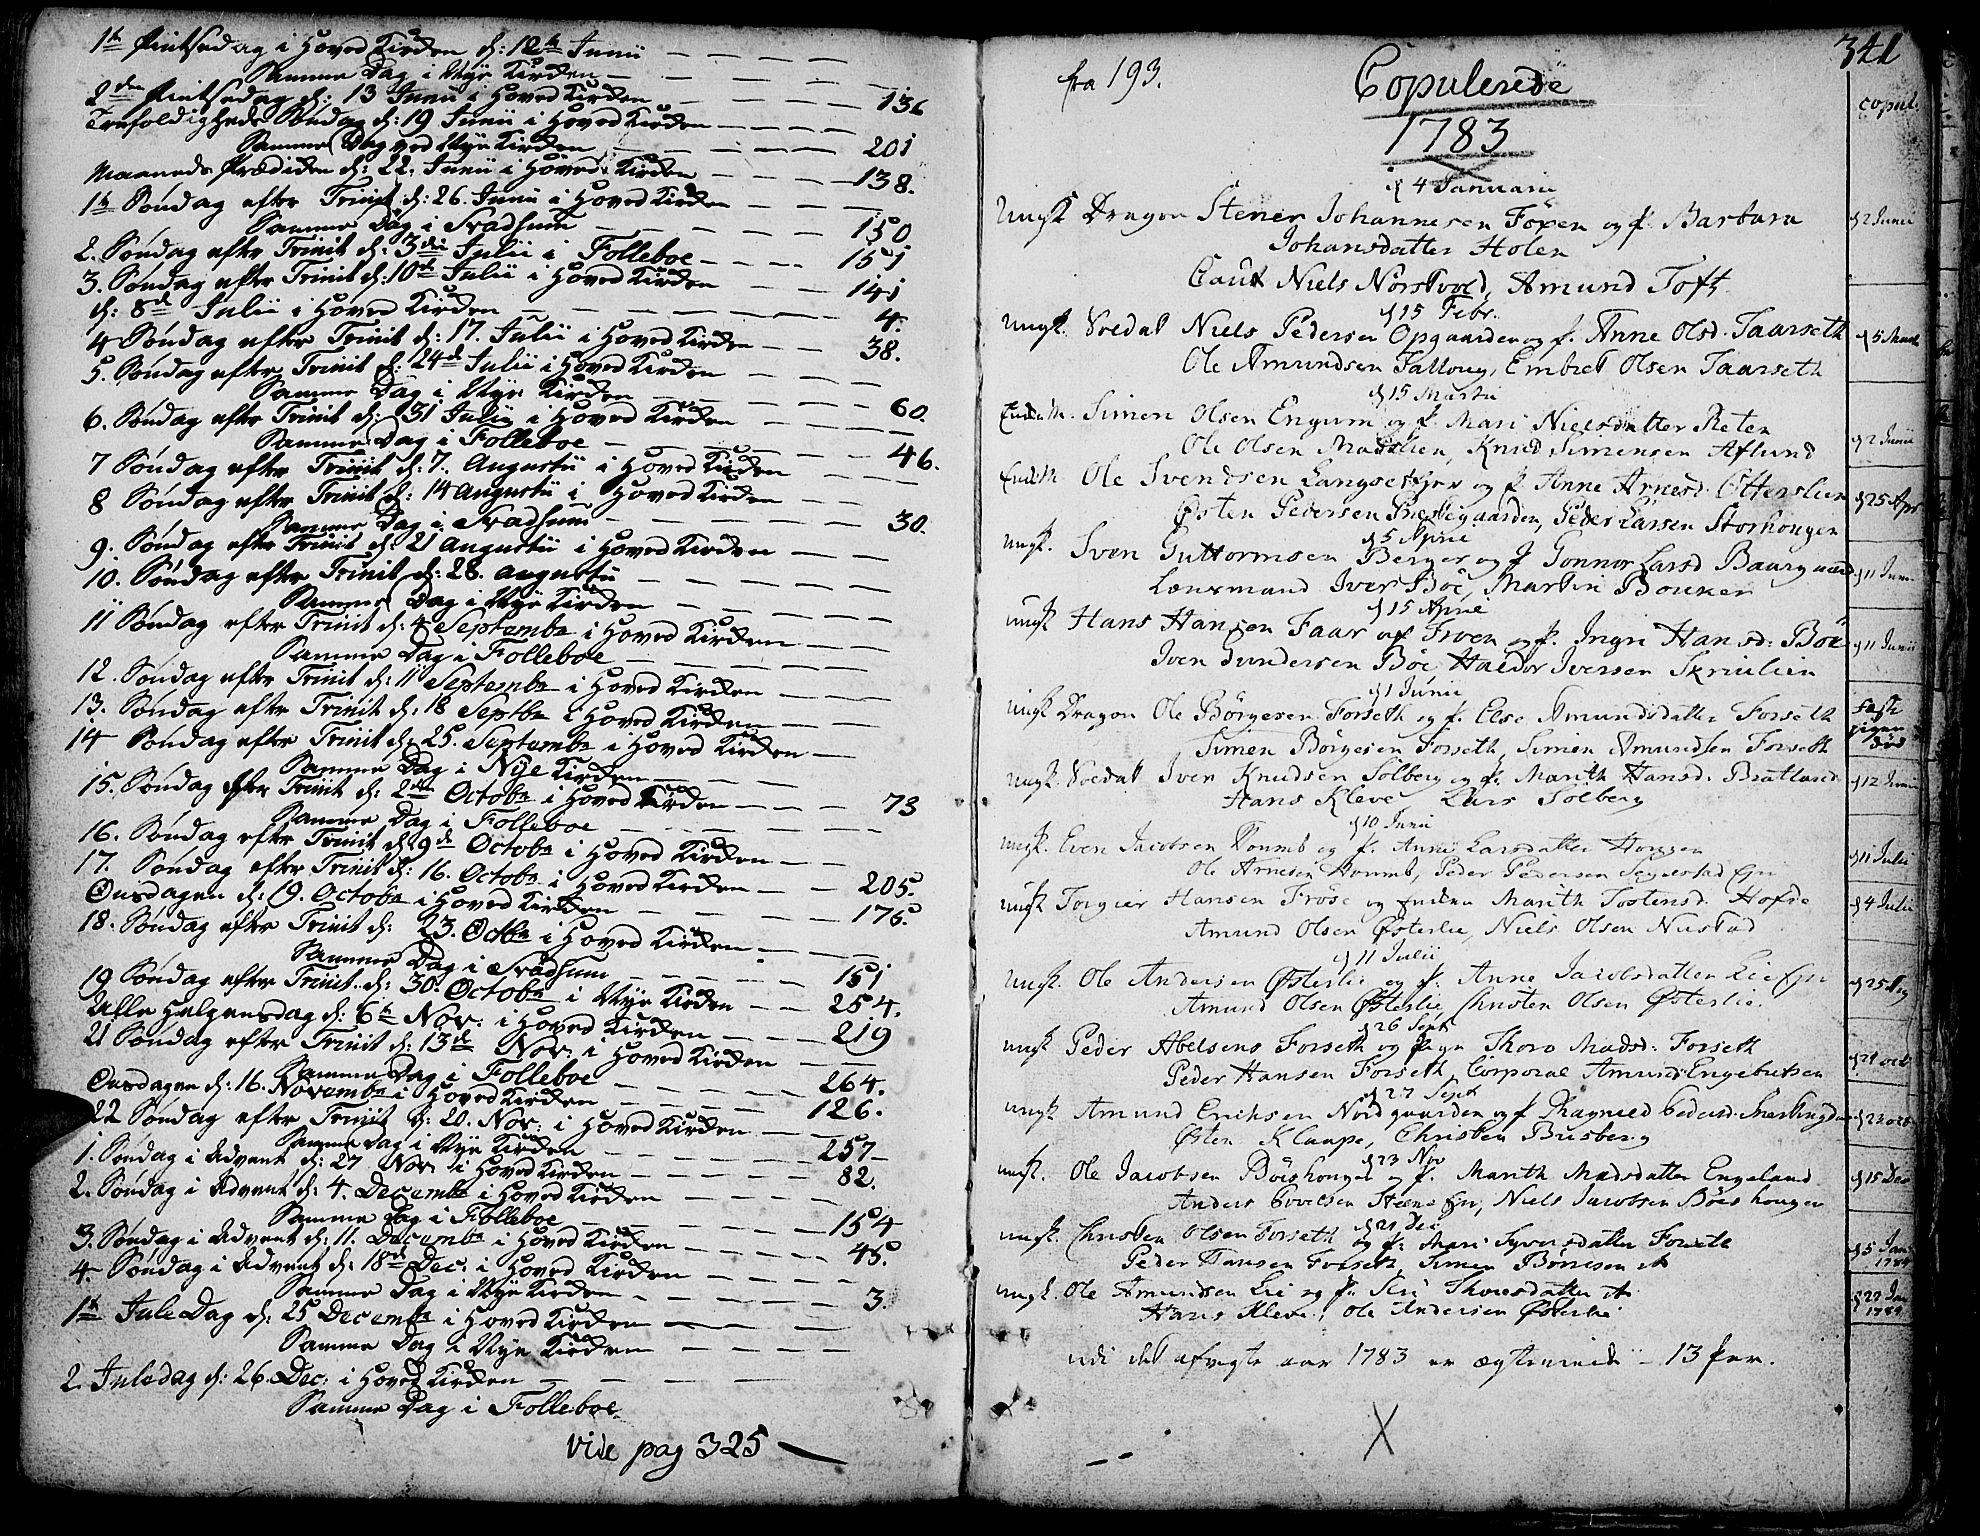 SAH, Gausdal prestekontor, Ministerialbok nr. 3, 1758-1809, s. 341